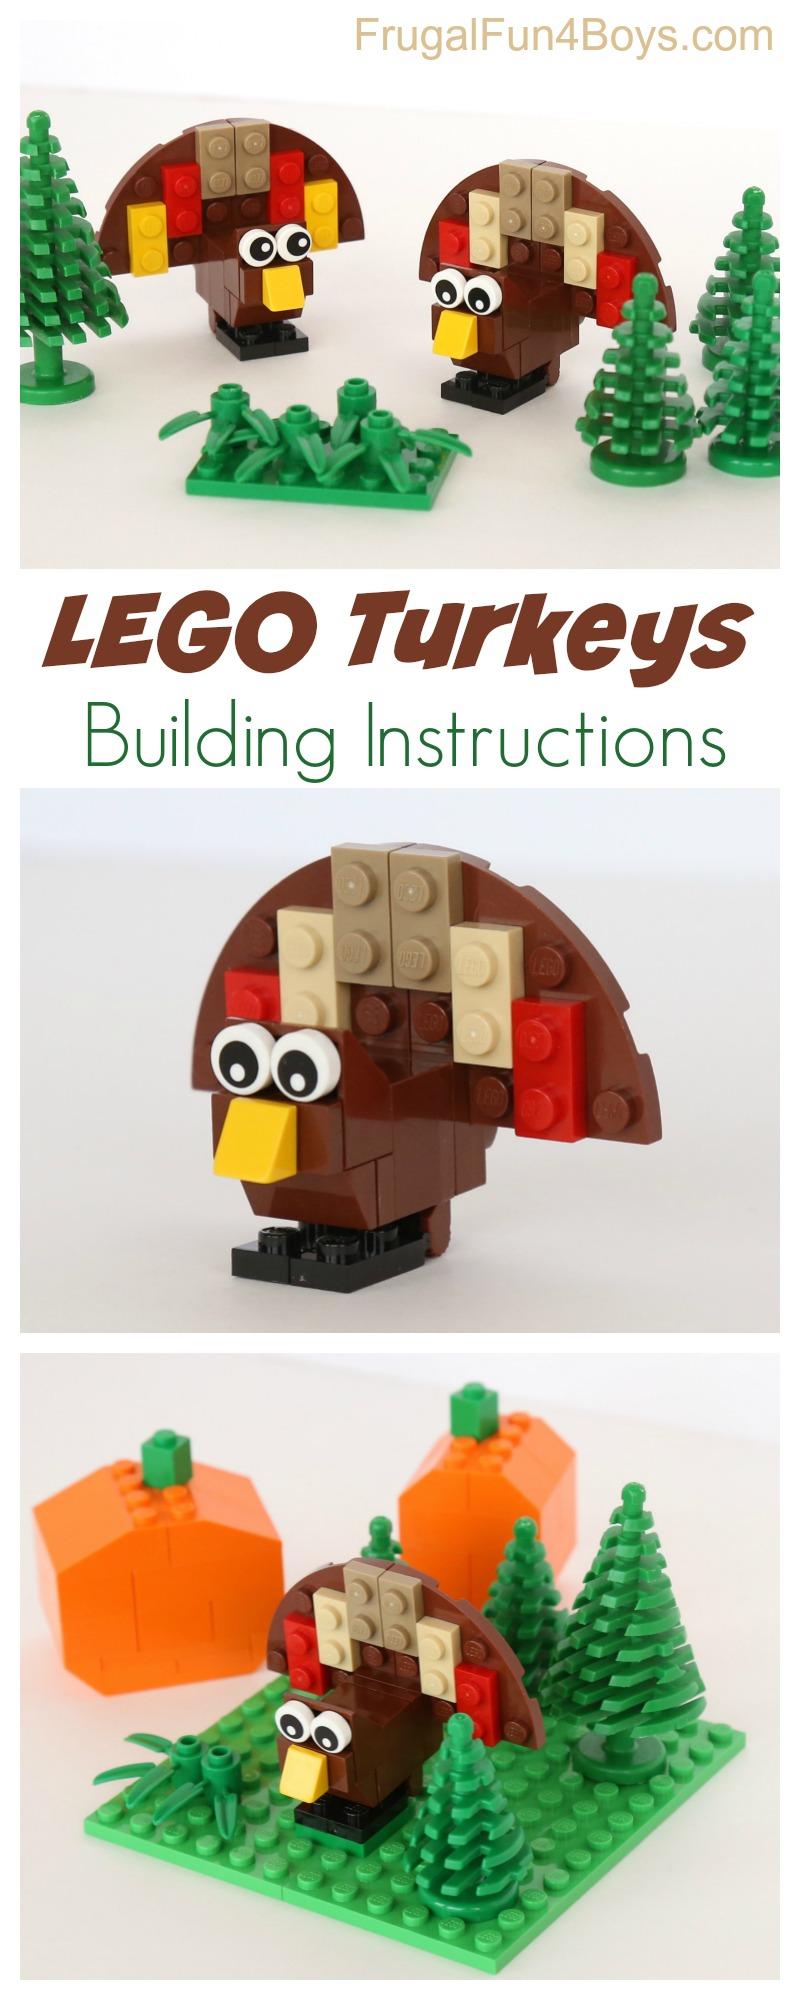 Lego Turkey Building Instructions Frugal Fun For Boys And Girls